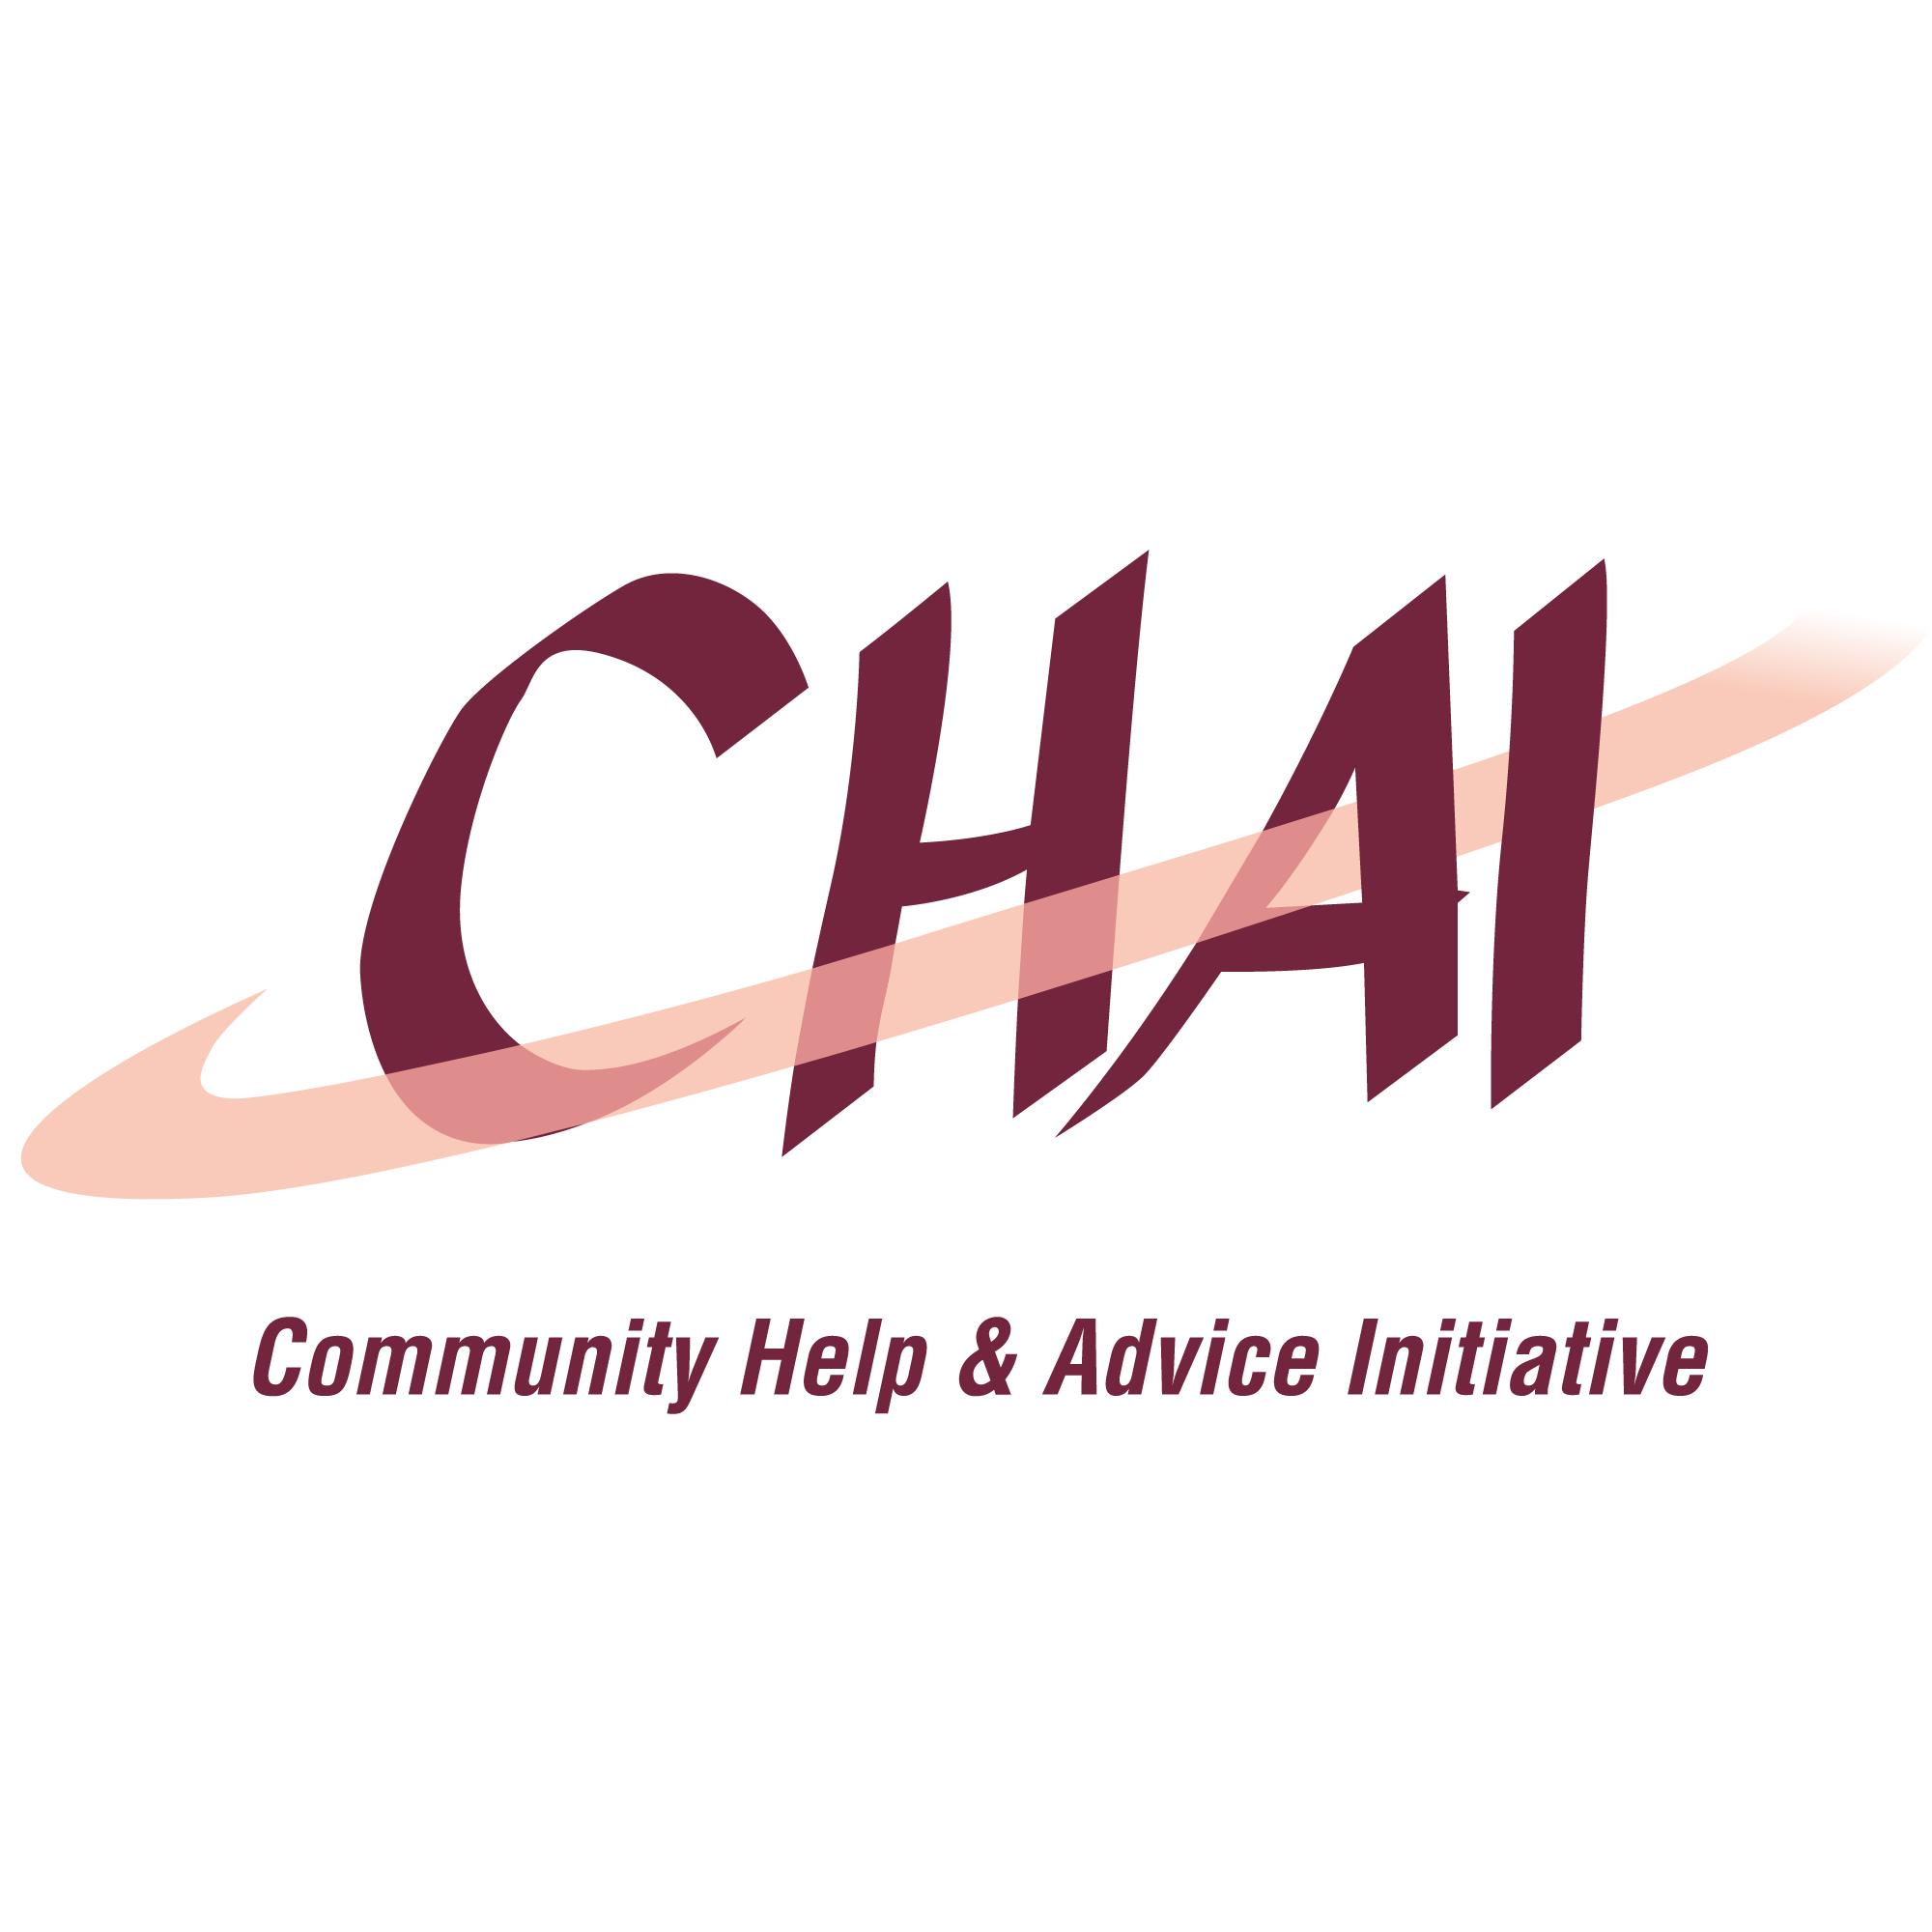 Community Help & Advice Initiative Ltd